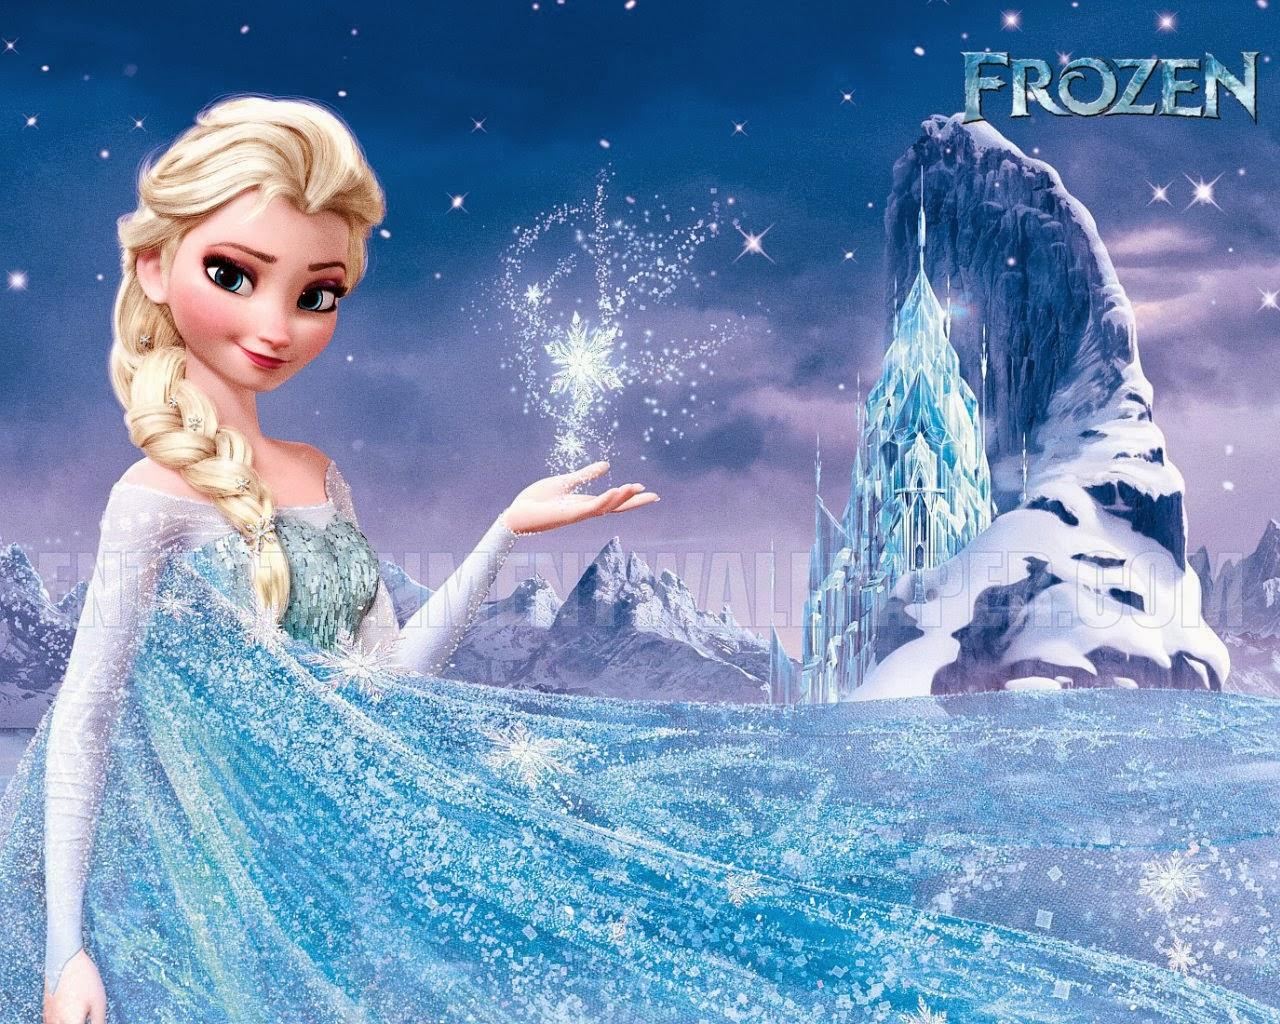 Frozen 2013 Full Movie Free